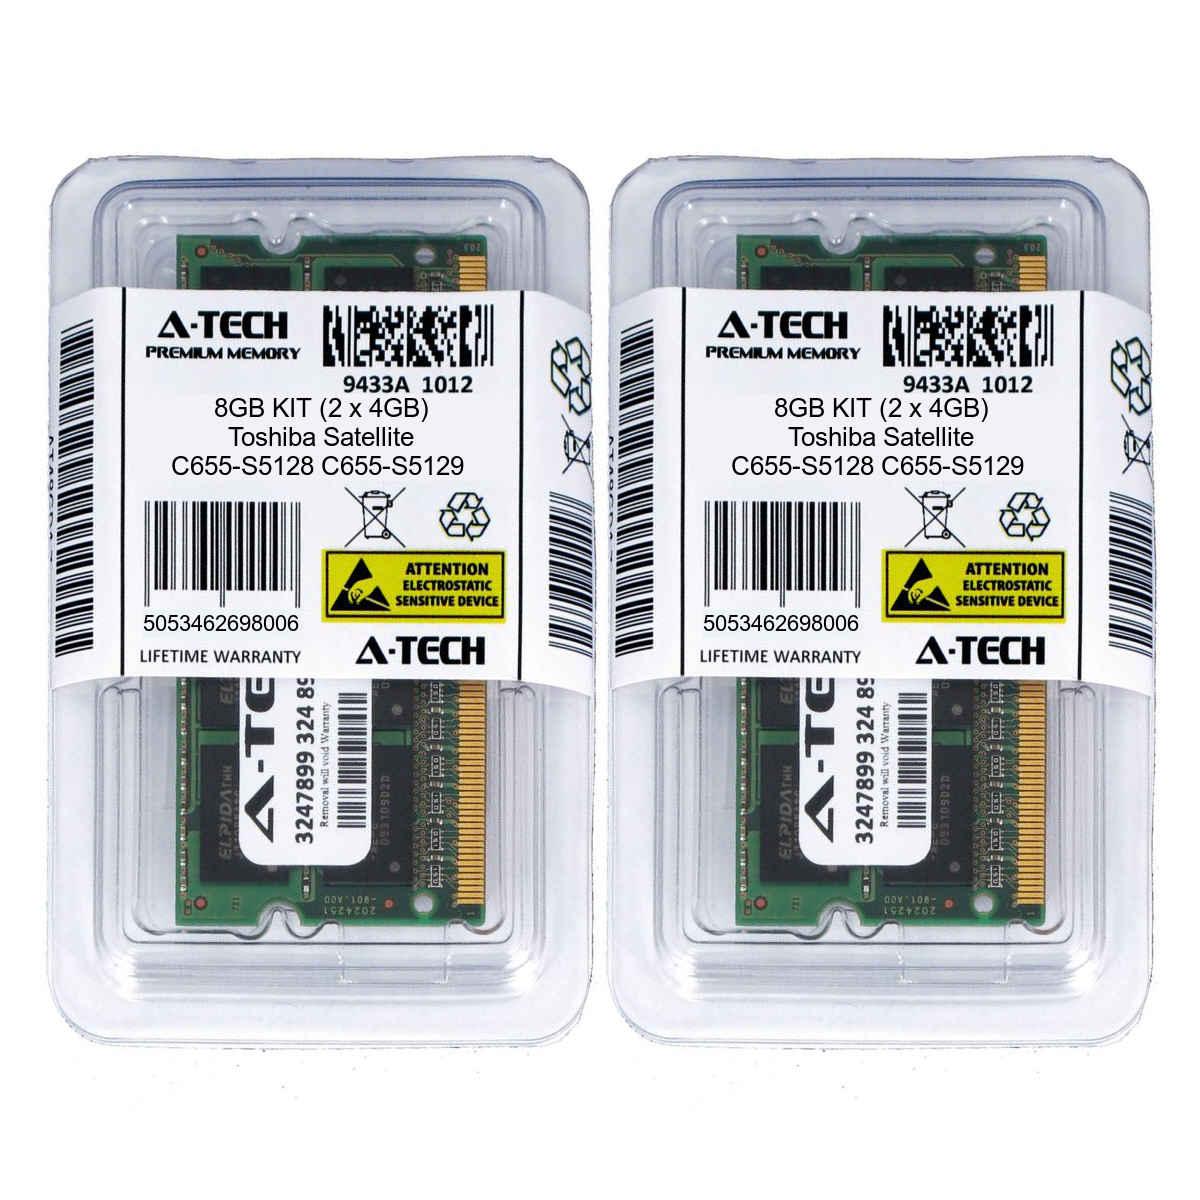 4GB SODIMM Toshiba Satellite C655-S5128 C655-S5129 C655-S5137 Ram Memory